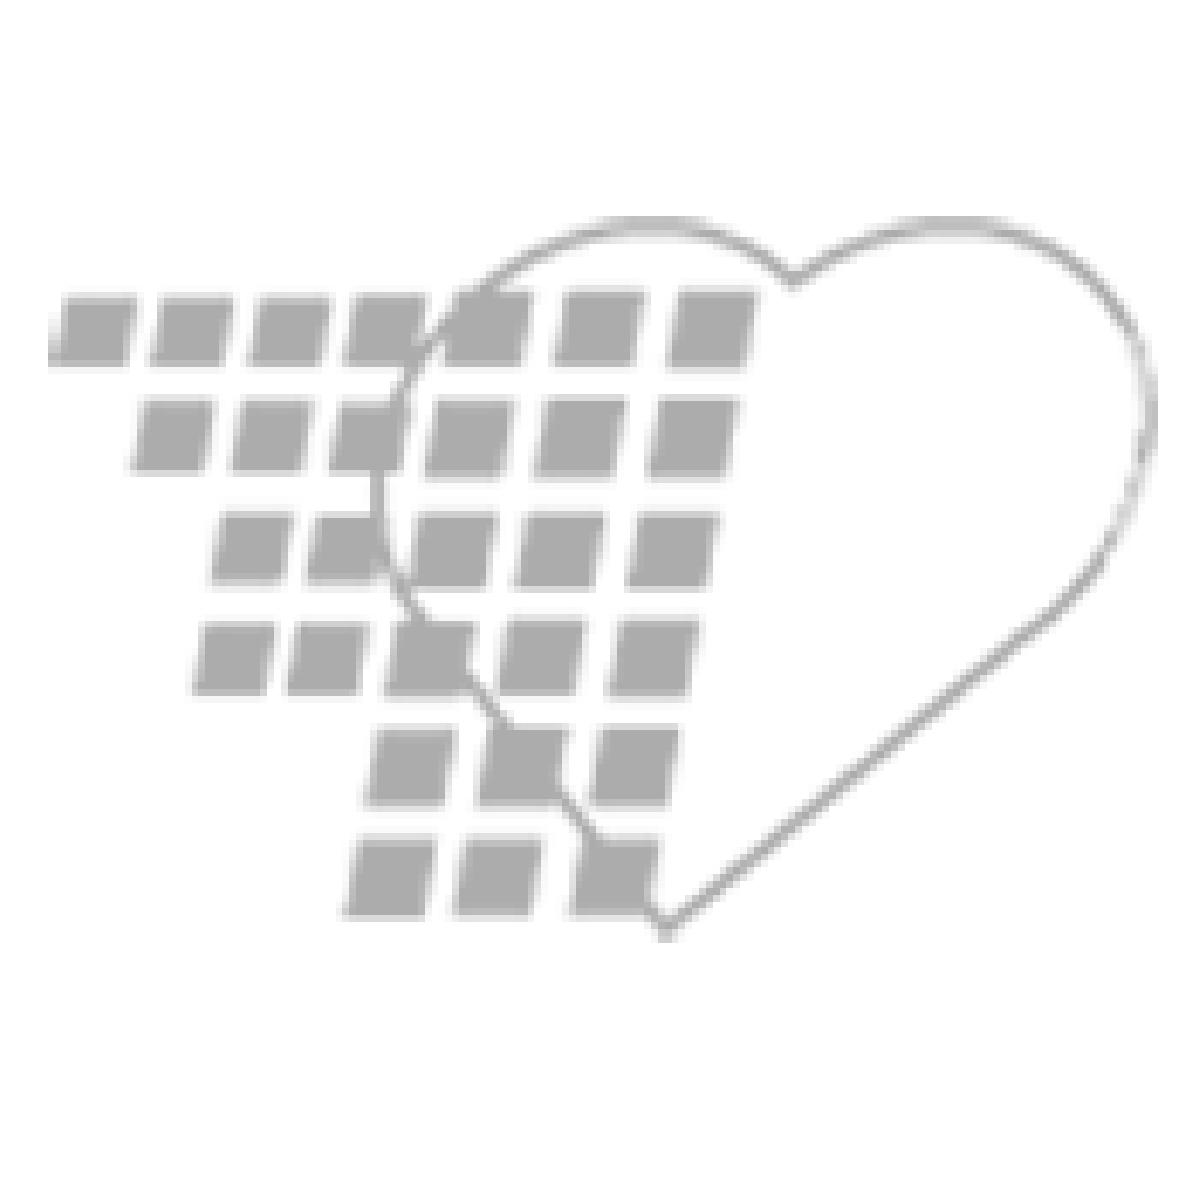 "06-82-5780 BD Eclipse® Needle1mL Syringe with Detachable 25G × 5/8"" Needle"